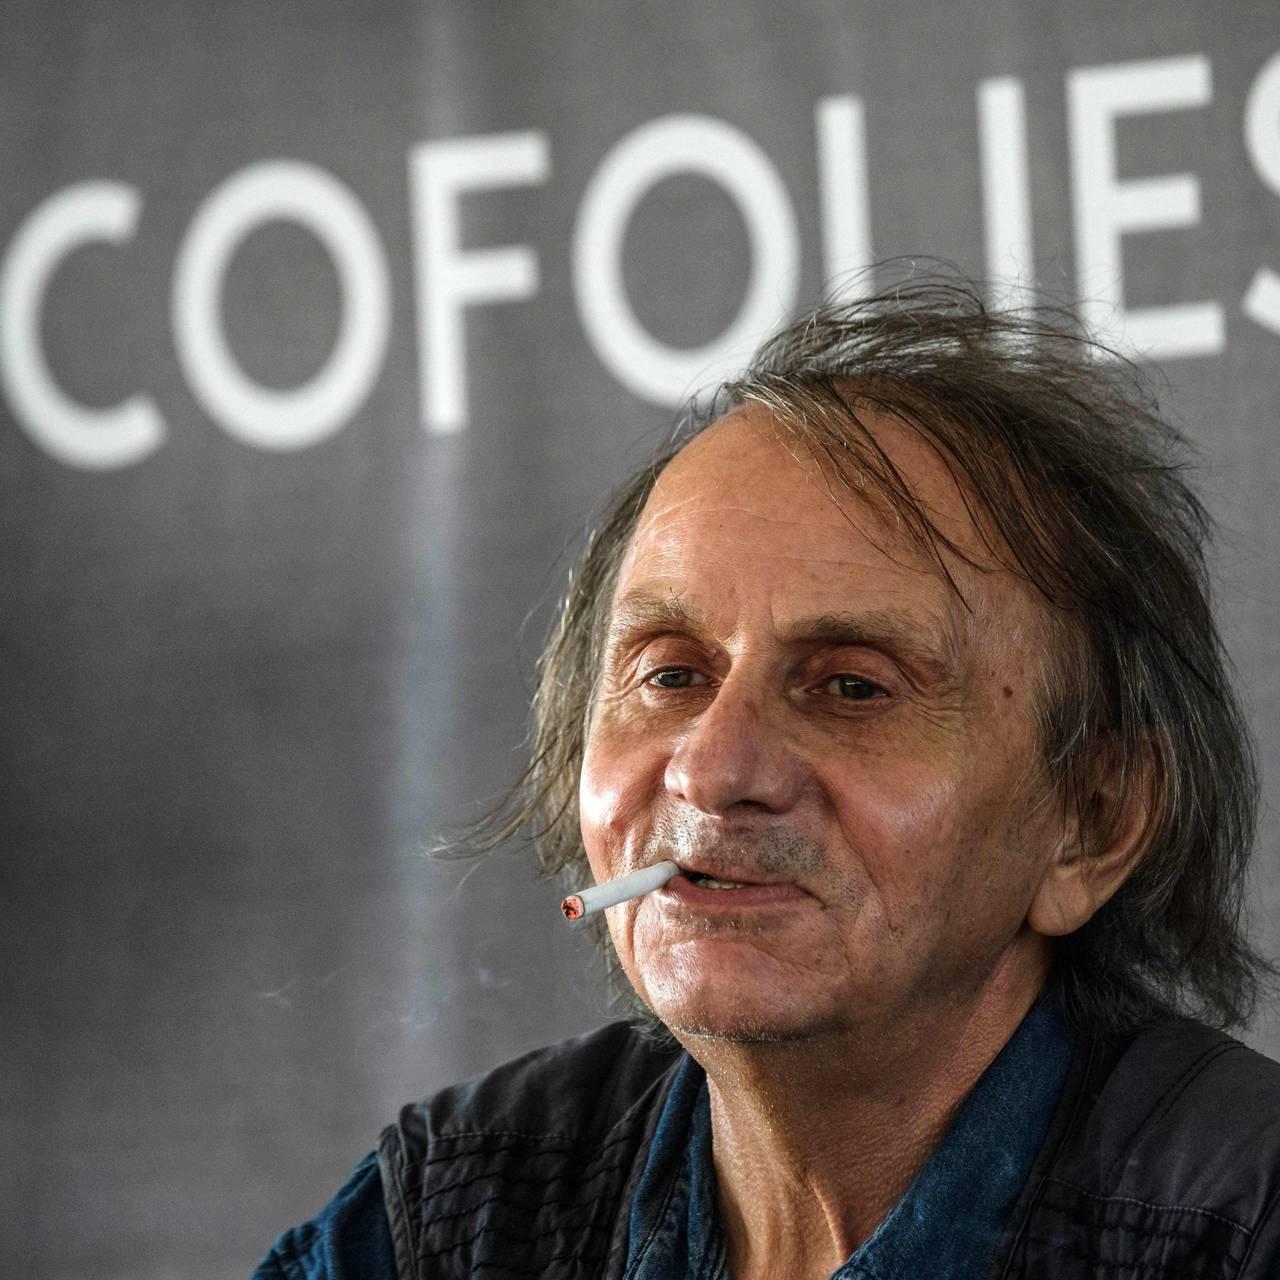 2019: Michel Houellebecq på musikkfestivalen Francofolies Music Festival. Ganske rocka i stilen.